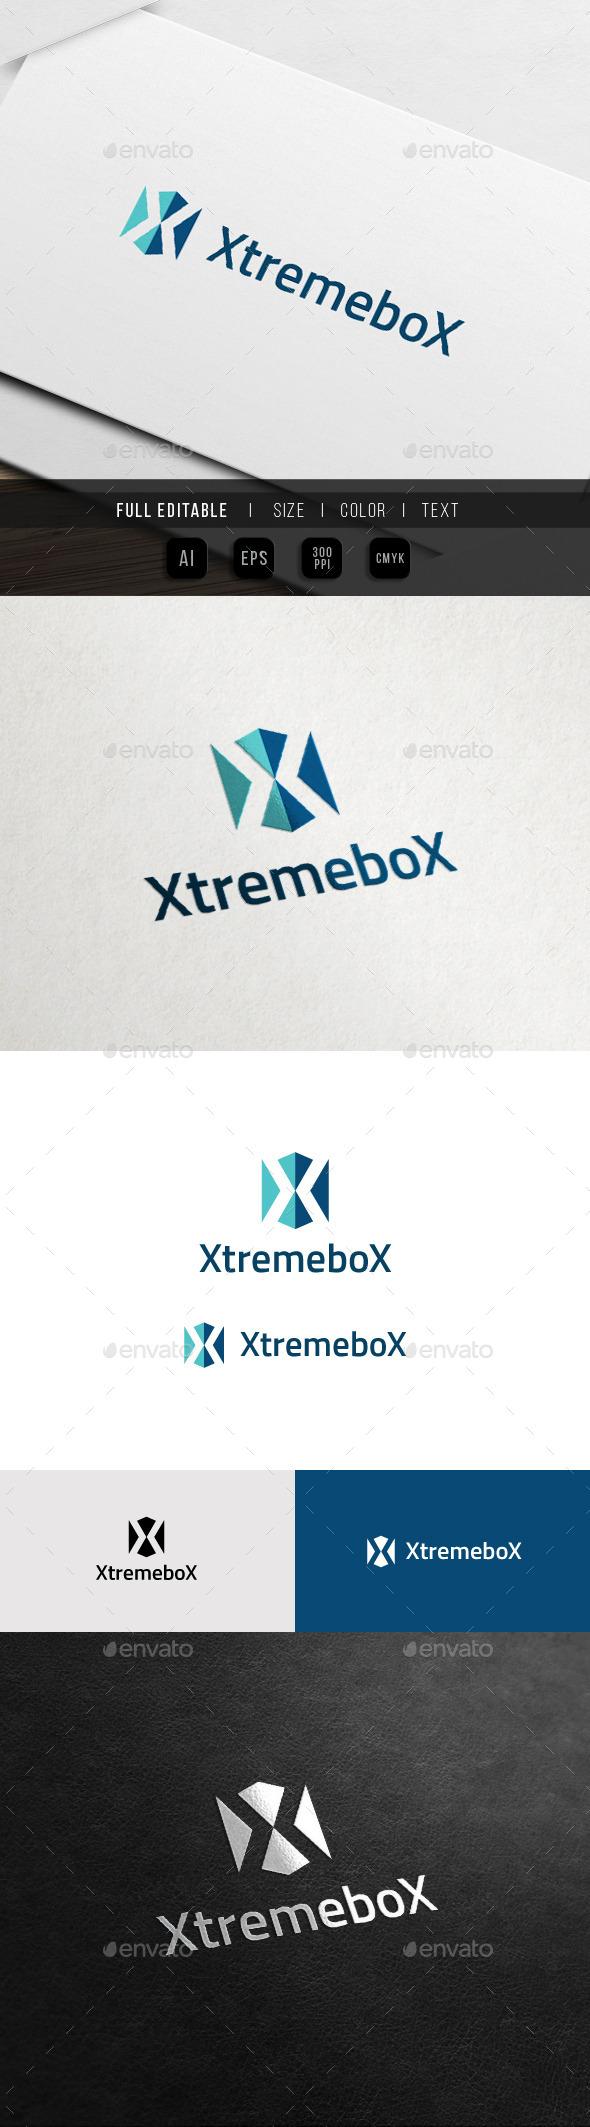 Extreme Box - X Sport Game - X Logo